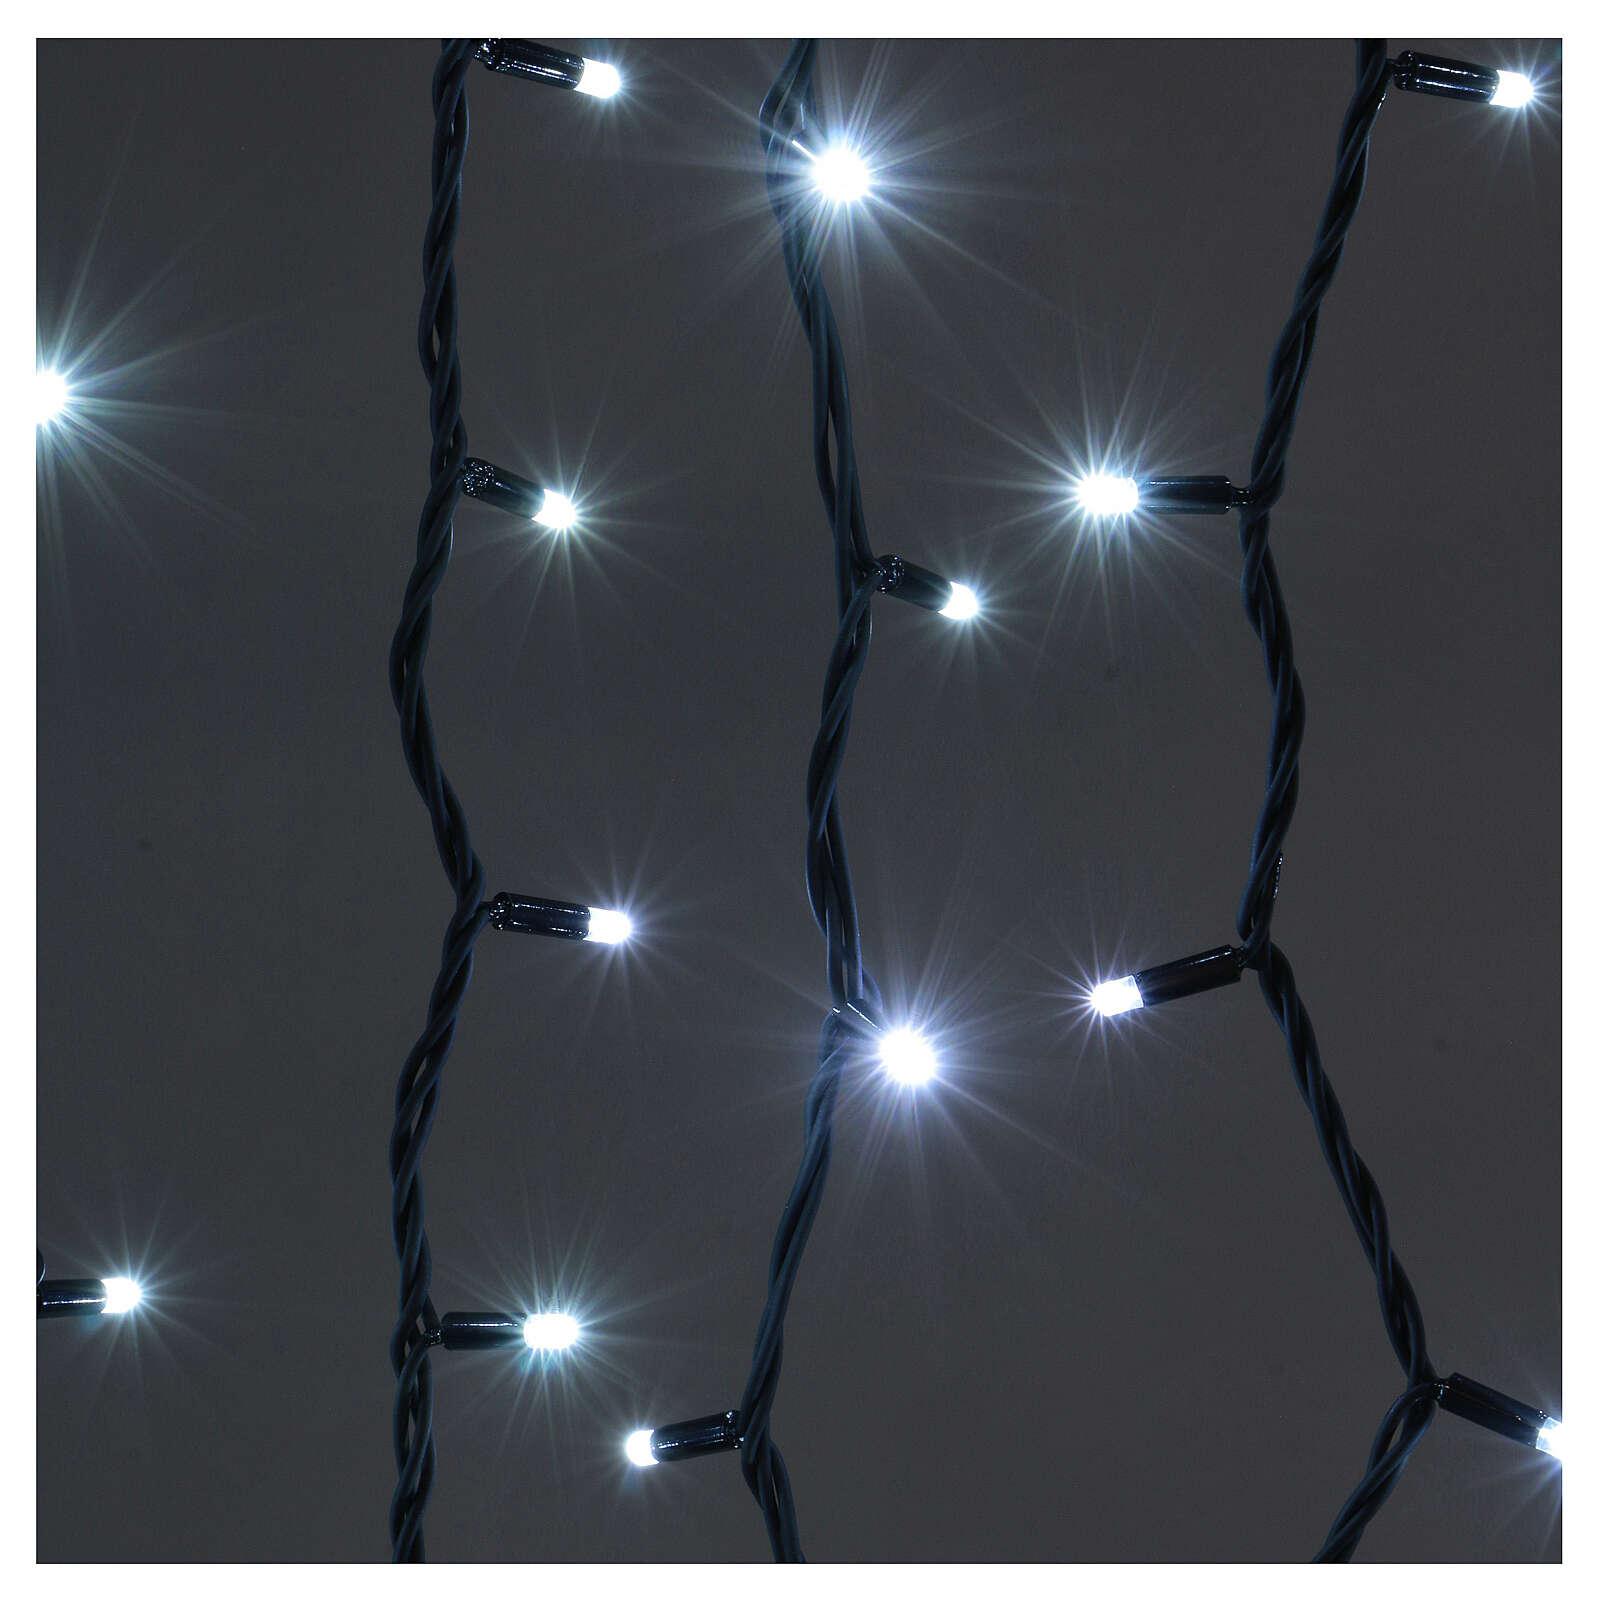 Jumbo LED String Light Curtain Ice White Extendable 3